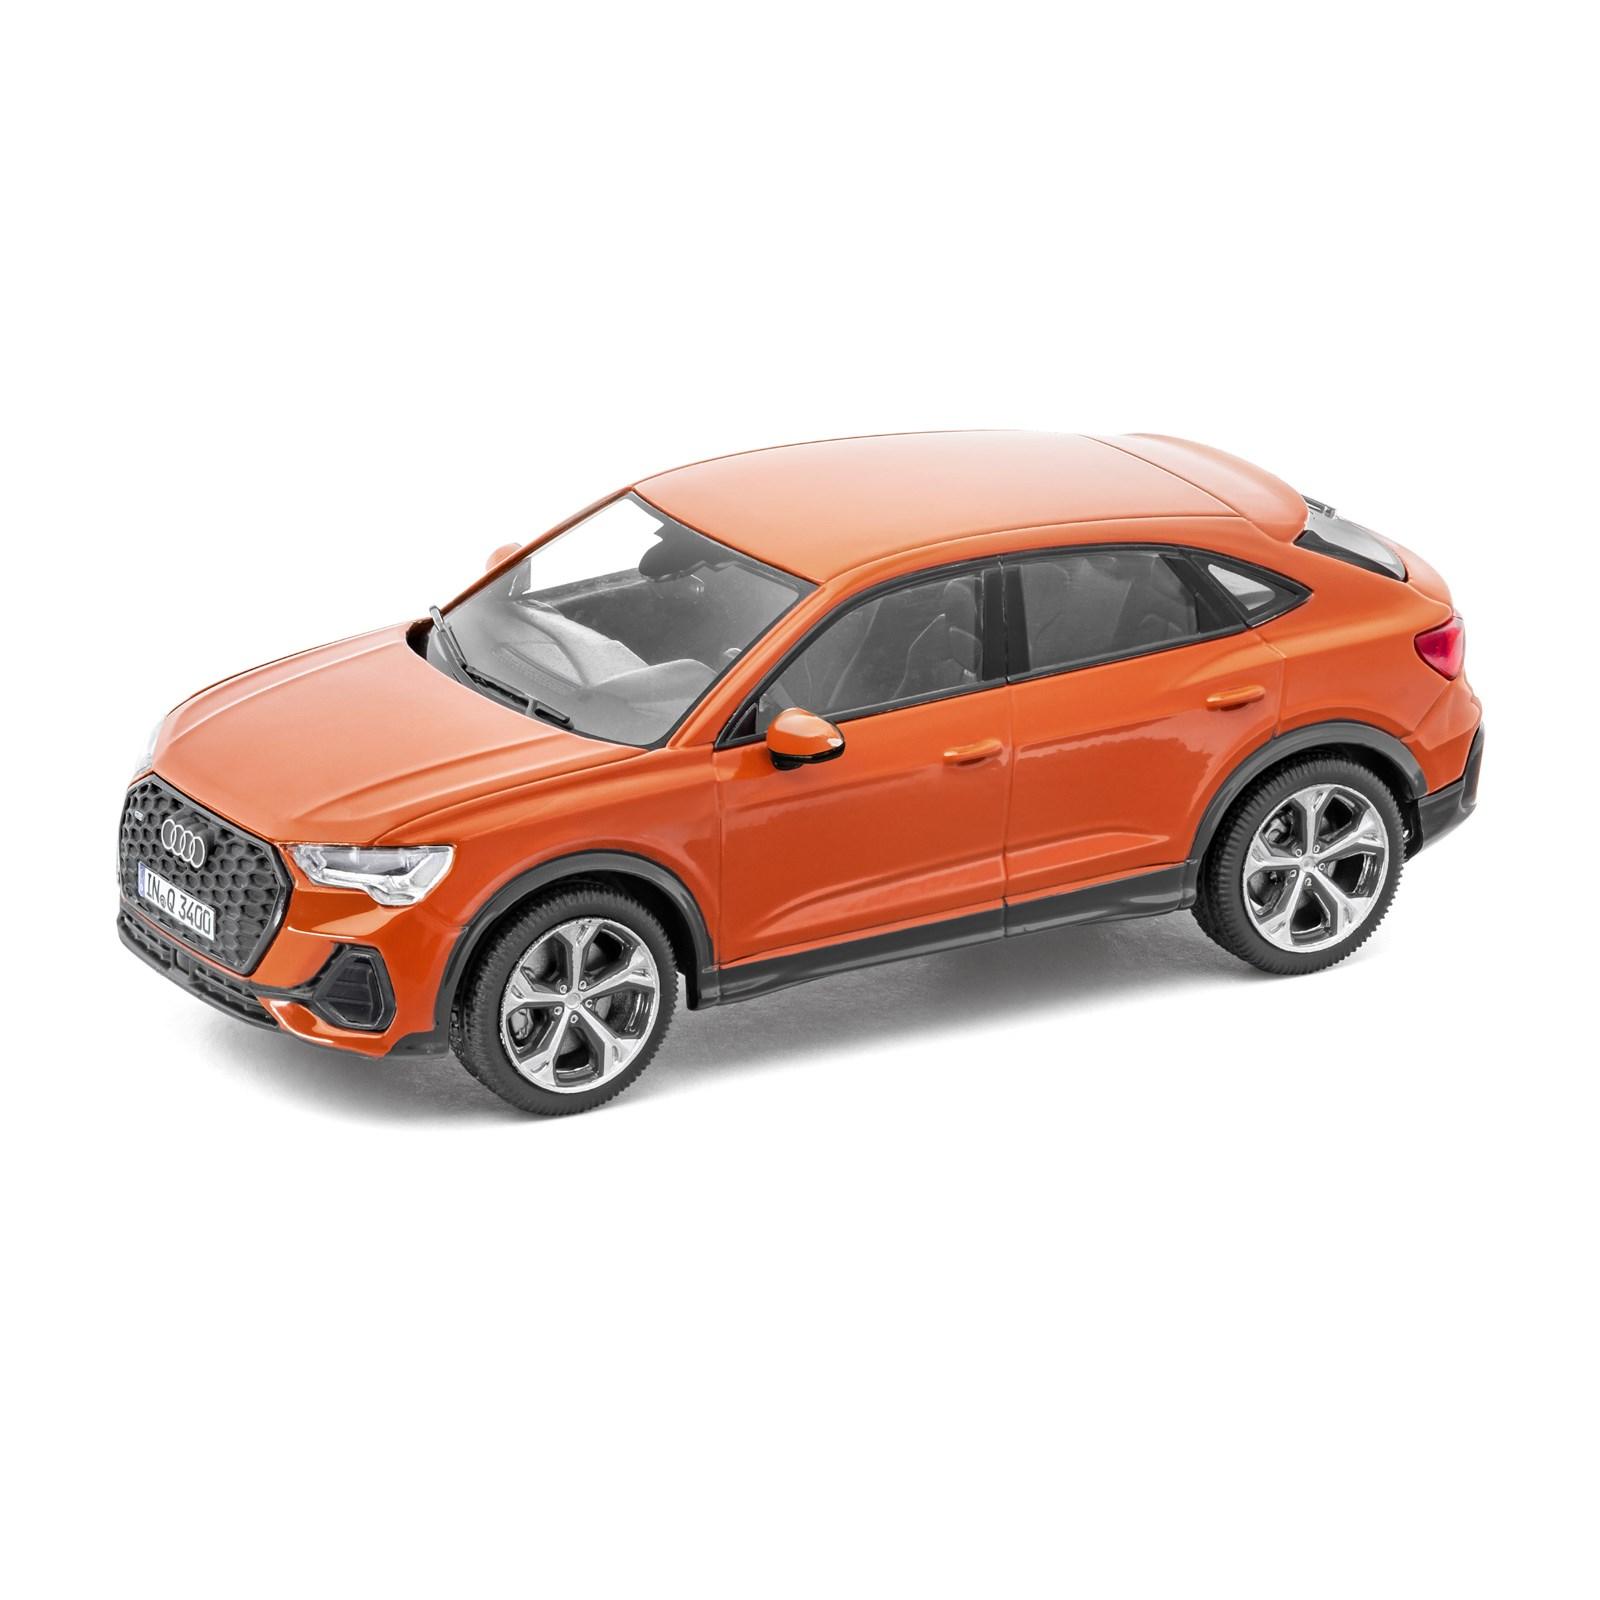 Audi 5011903031 Modellauto 1:43 Miniatur A3 Sportback Modell blau